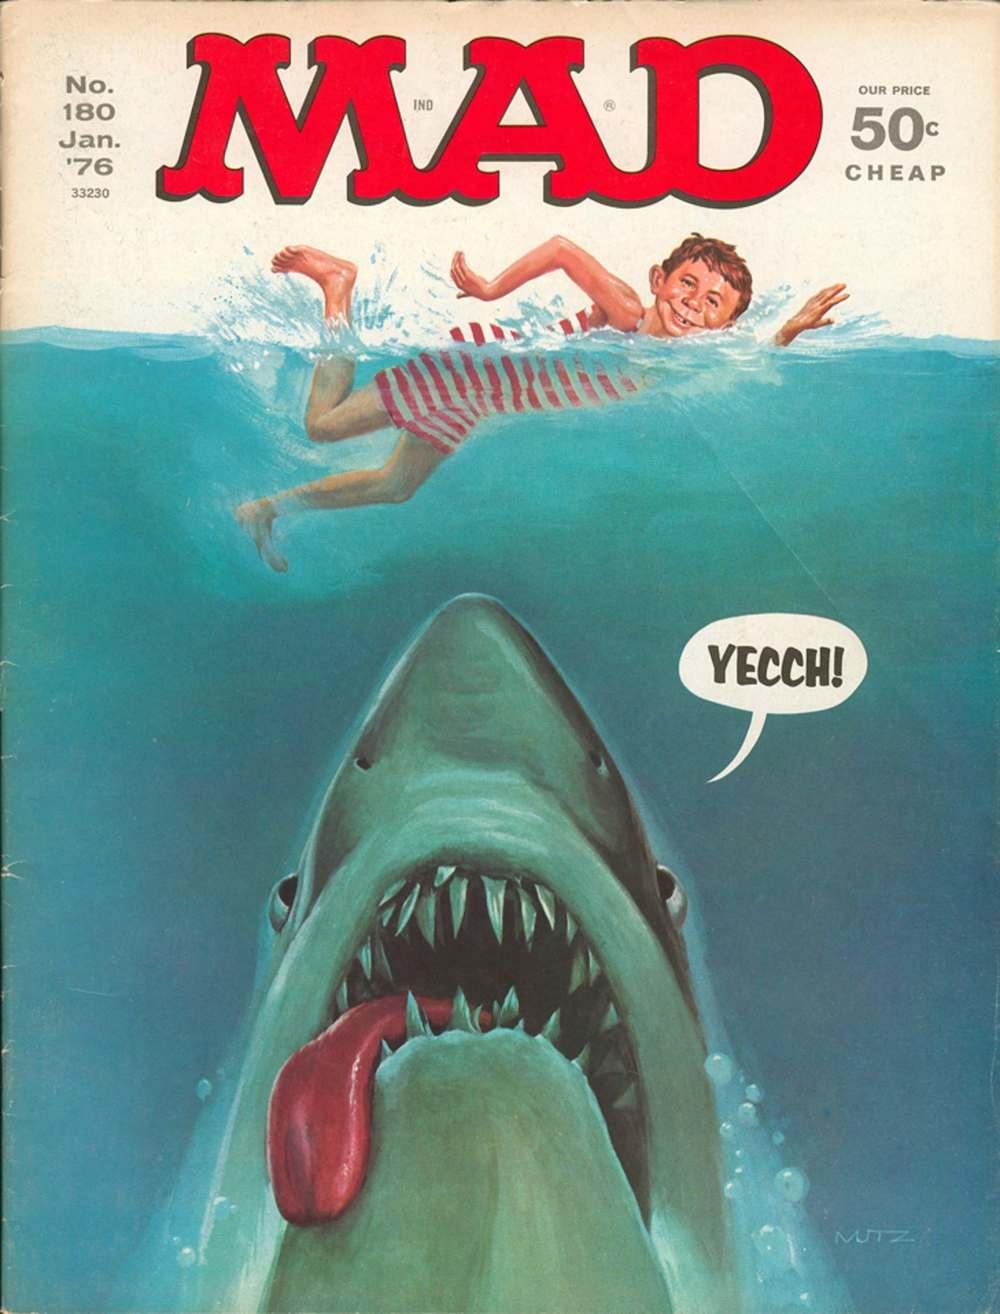 'Jaws', January 1976 by Mort Künstler.